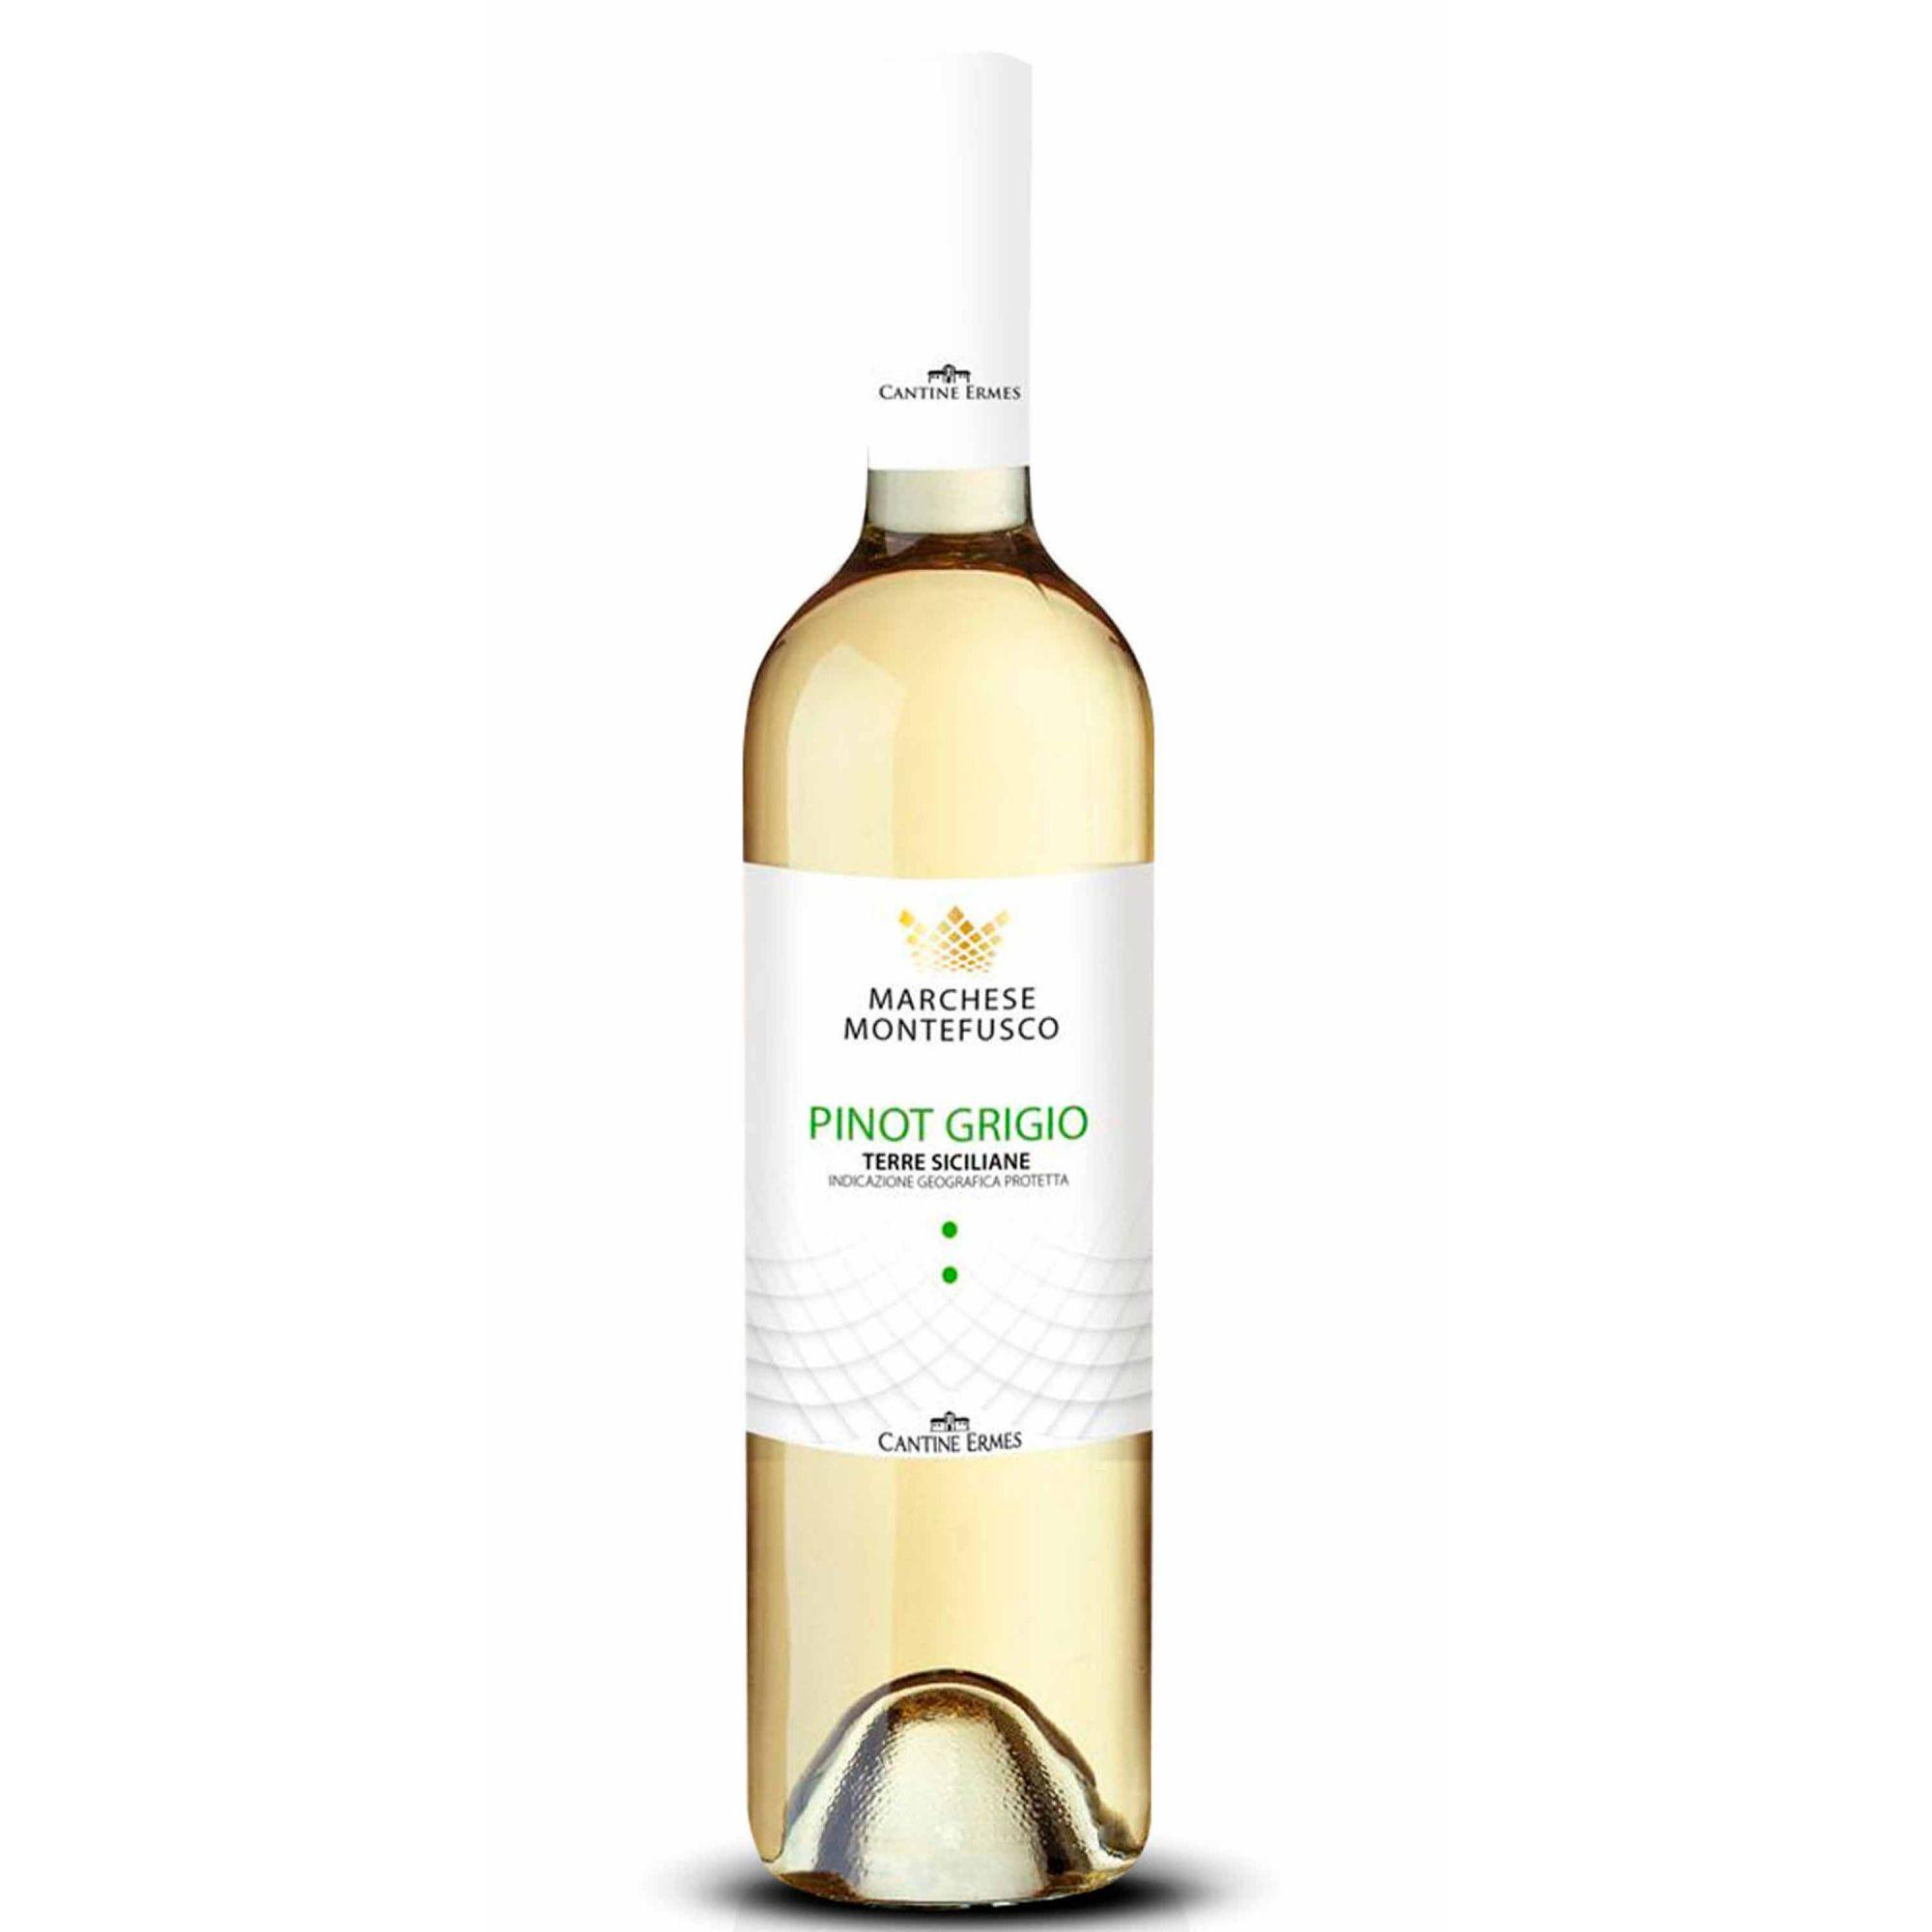 Vinho Marchese Montefusco Pinot Grigio IGT